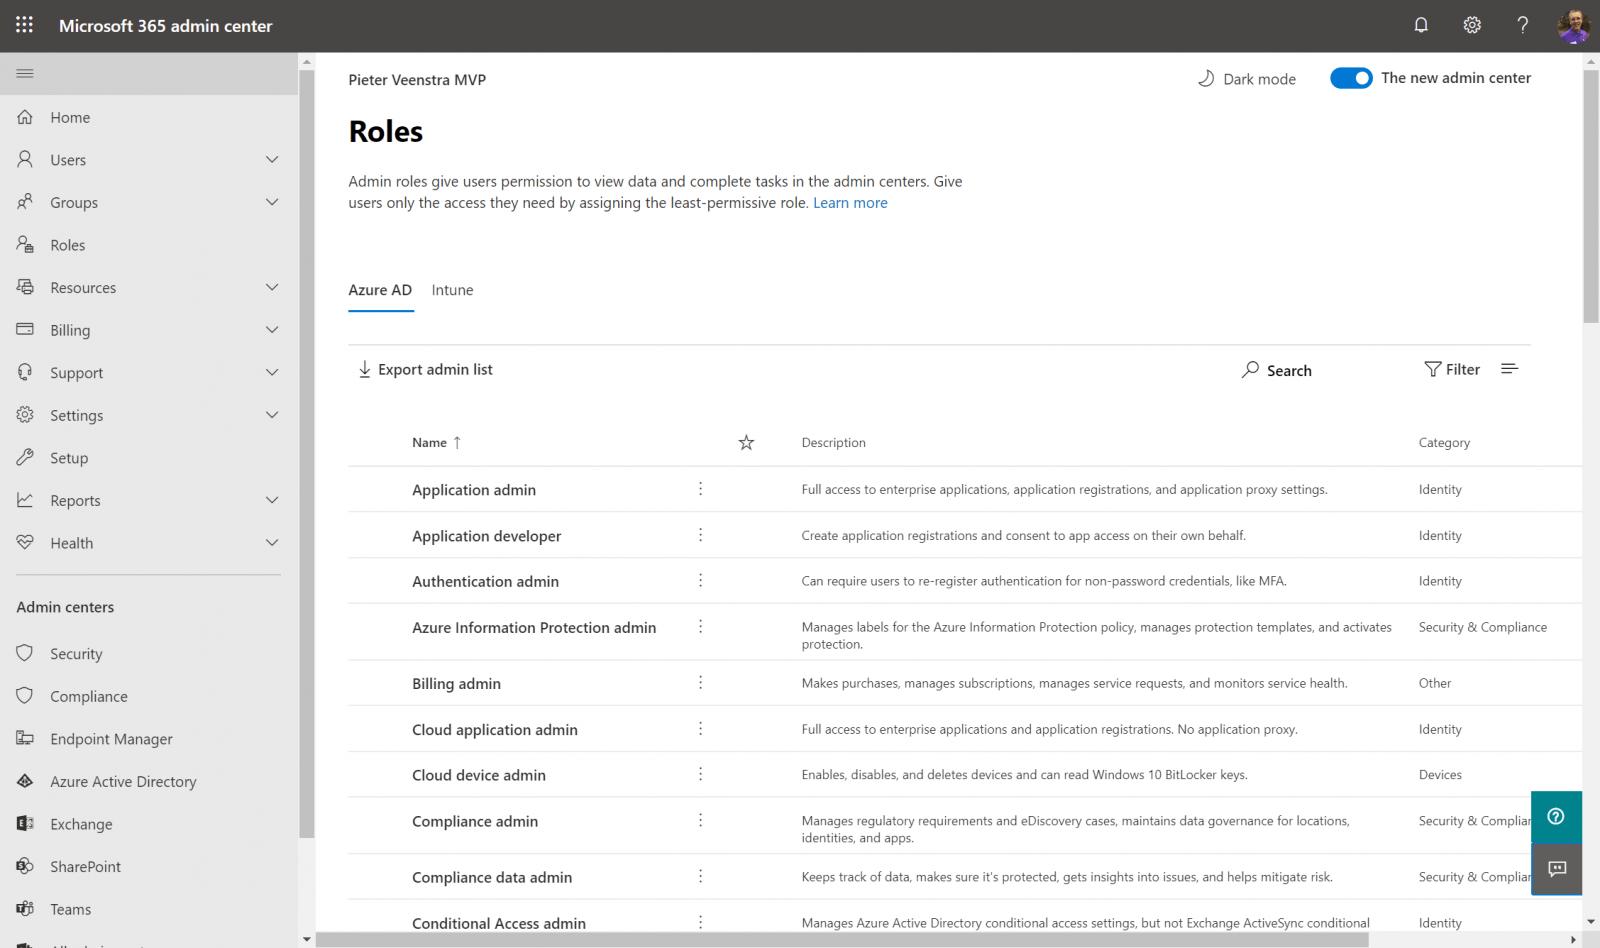 Roles in Microsoft 365